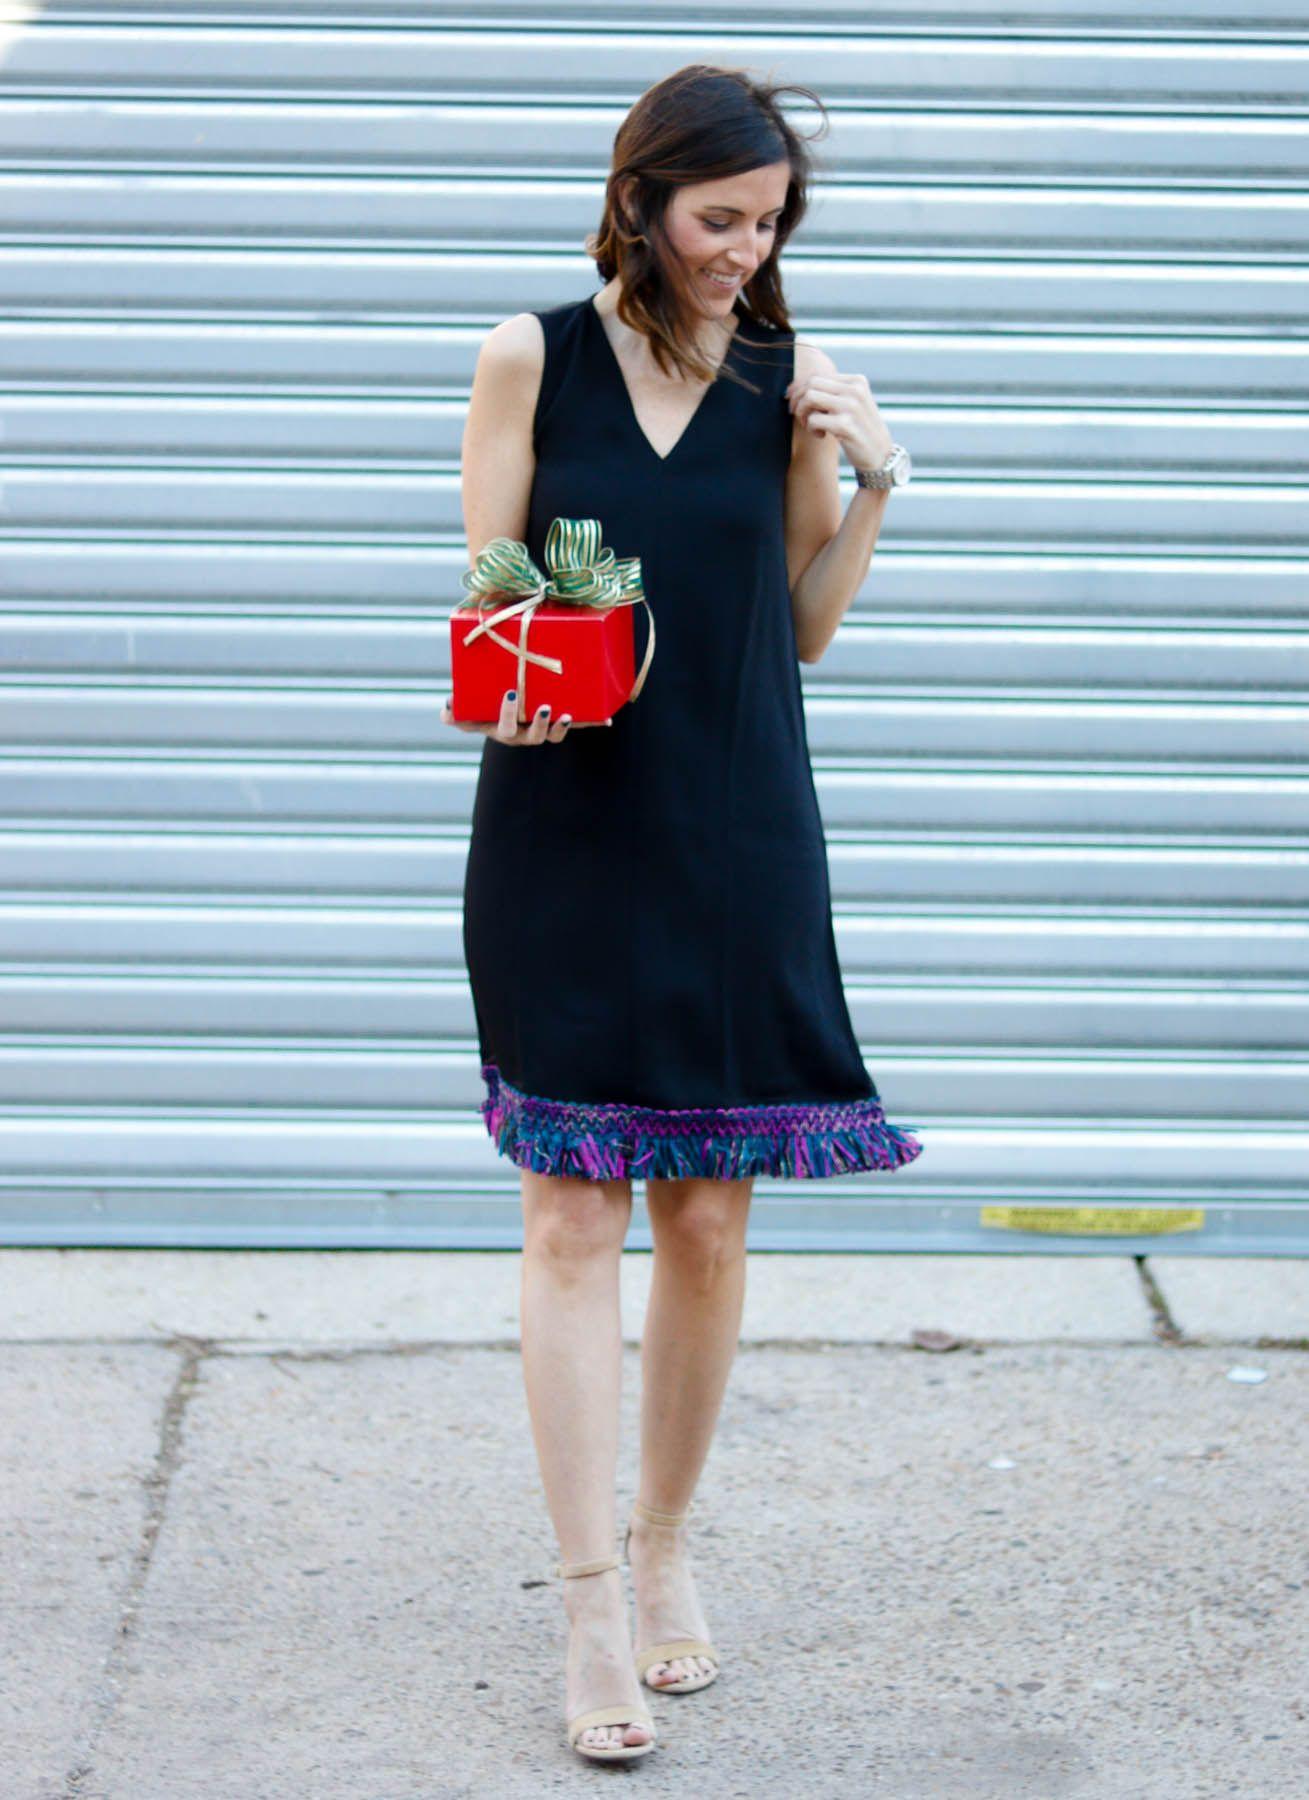 Versatile Holiday Party Dress | Pinterest fashion, Fashion bloggers ...